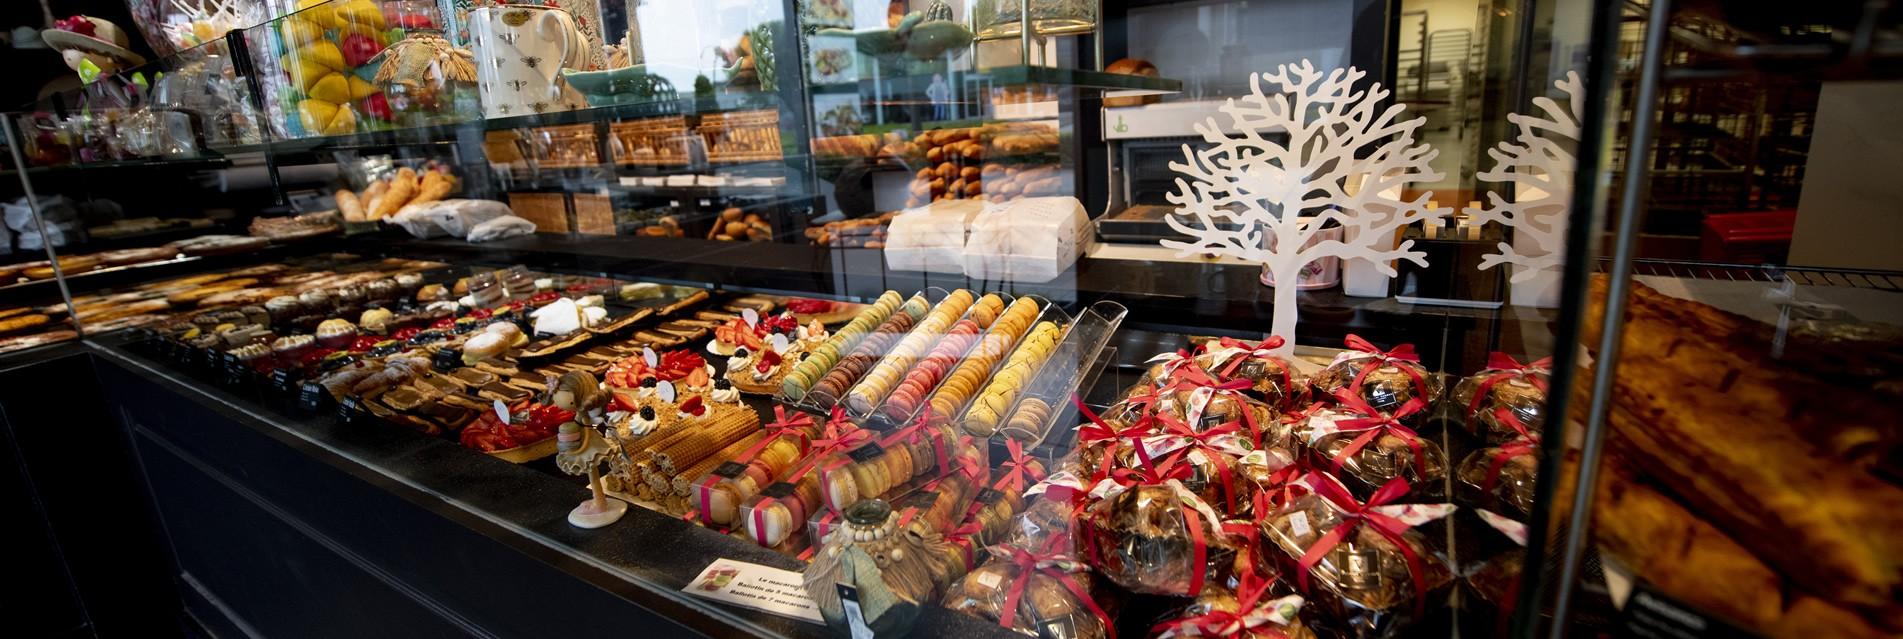 Boulangerie Ciney-Dinant-Jambes